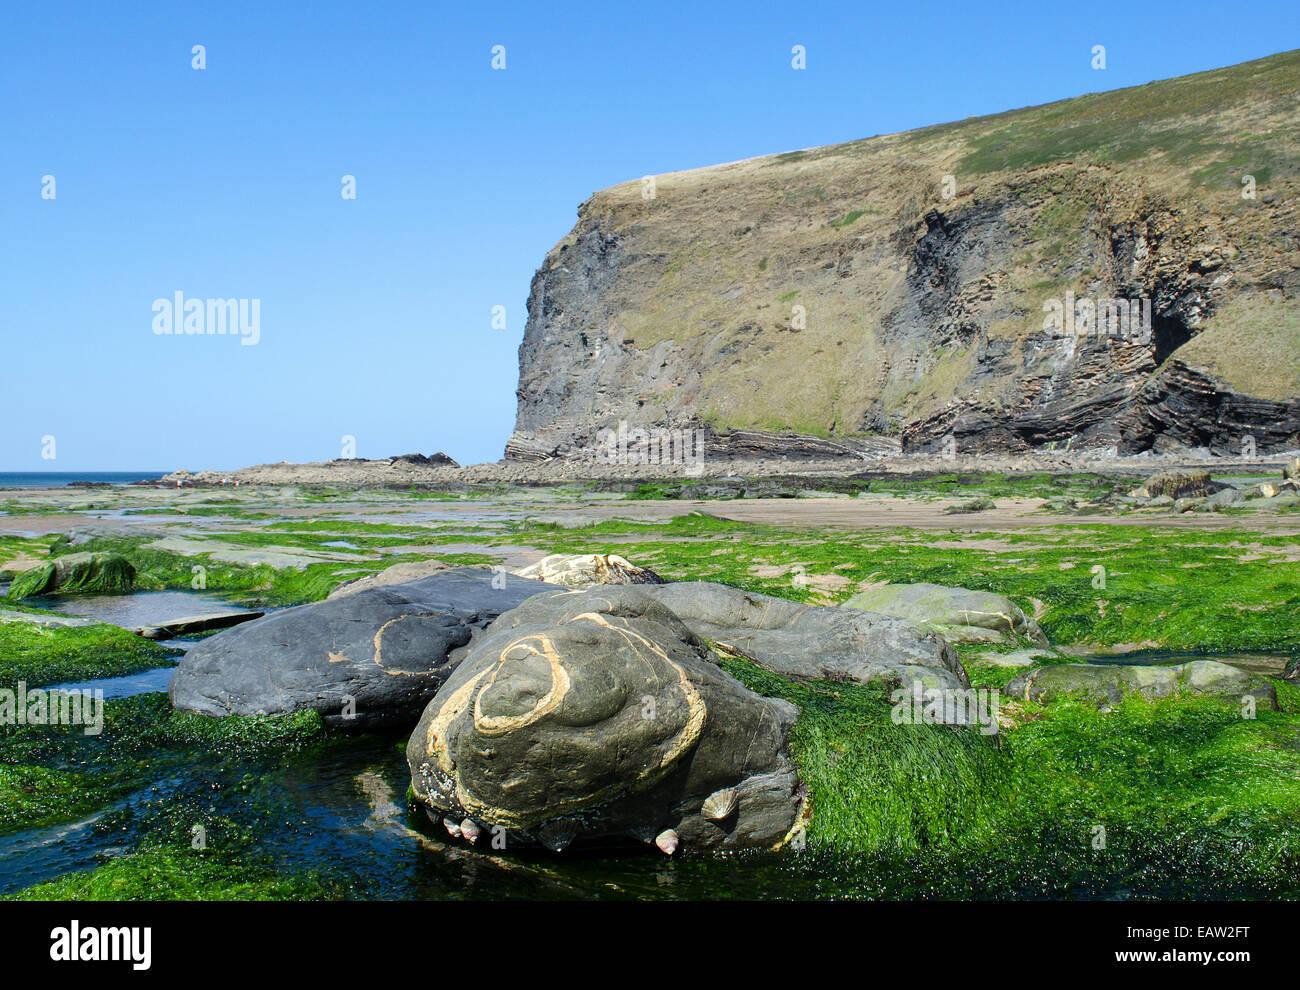 Quartz Veins in rocks on the beach at Crackington Haven, Cornwall, Uk - Stock Image